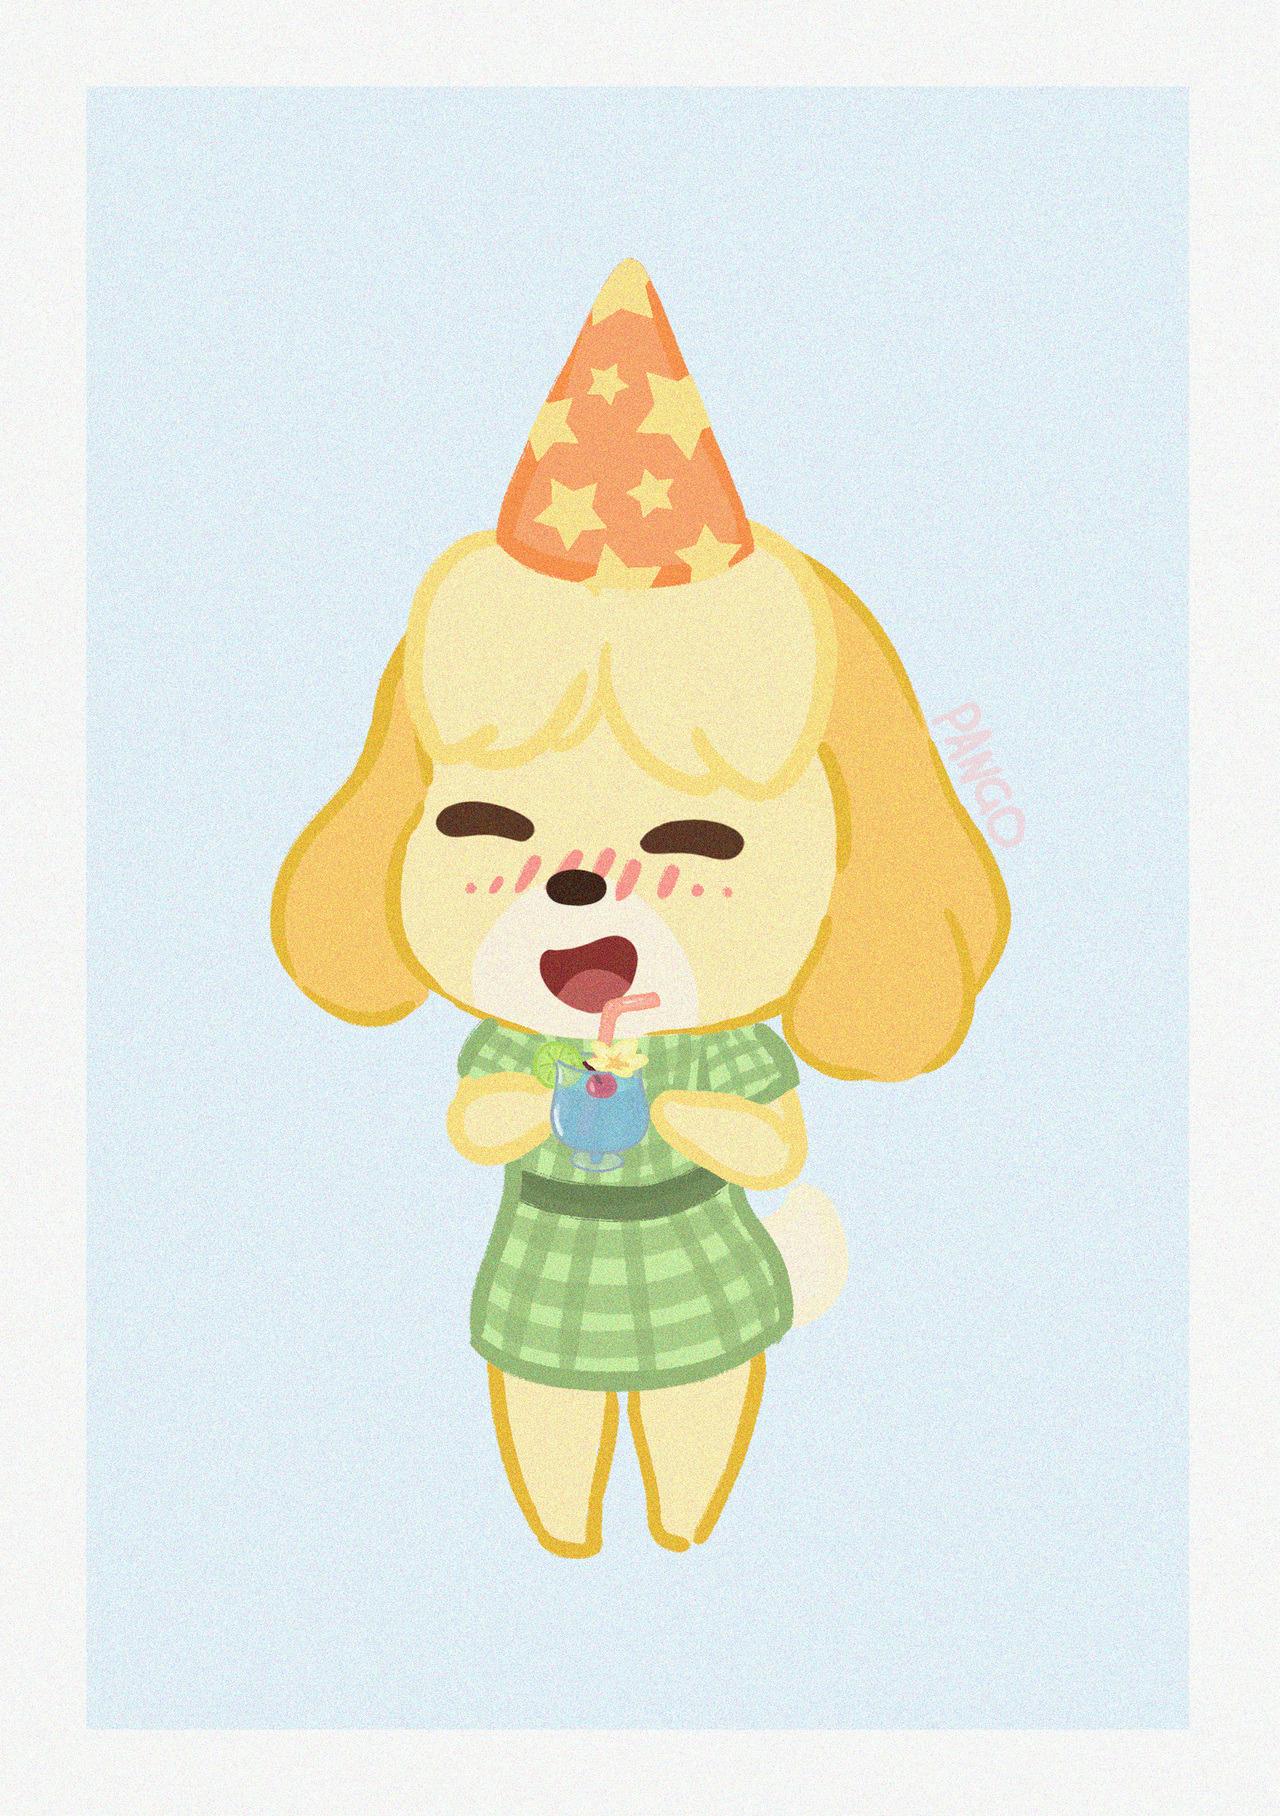 Animal Crossing Fun Times Babypango Vacation Juice